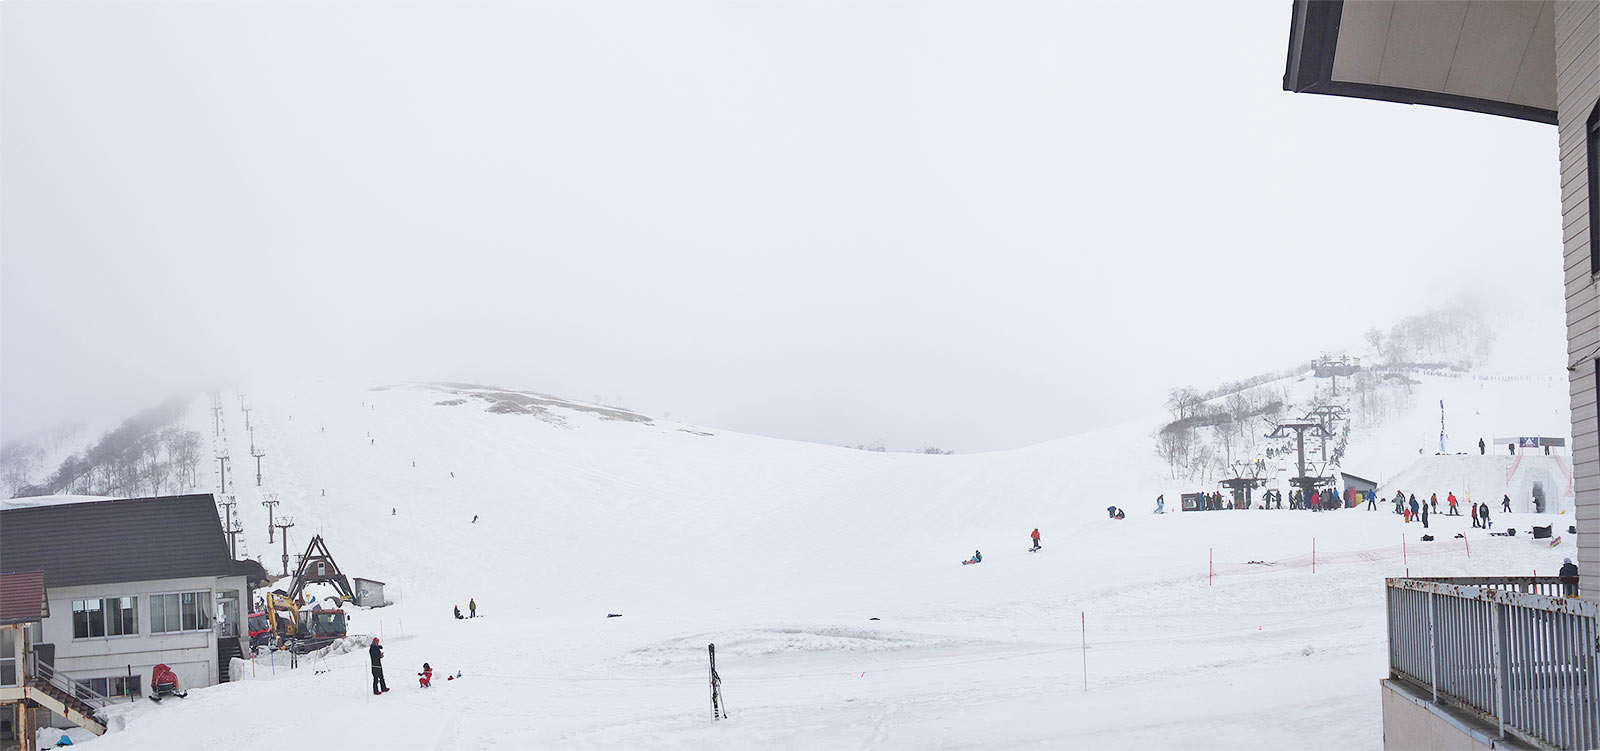 япония, гунма, минаками, гора, танигава, лыжи, сноуборд